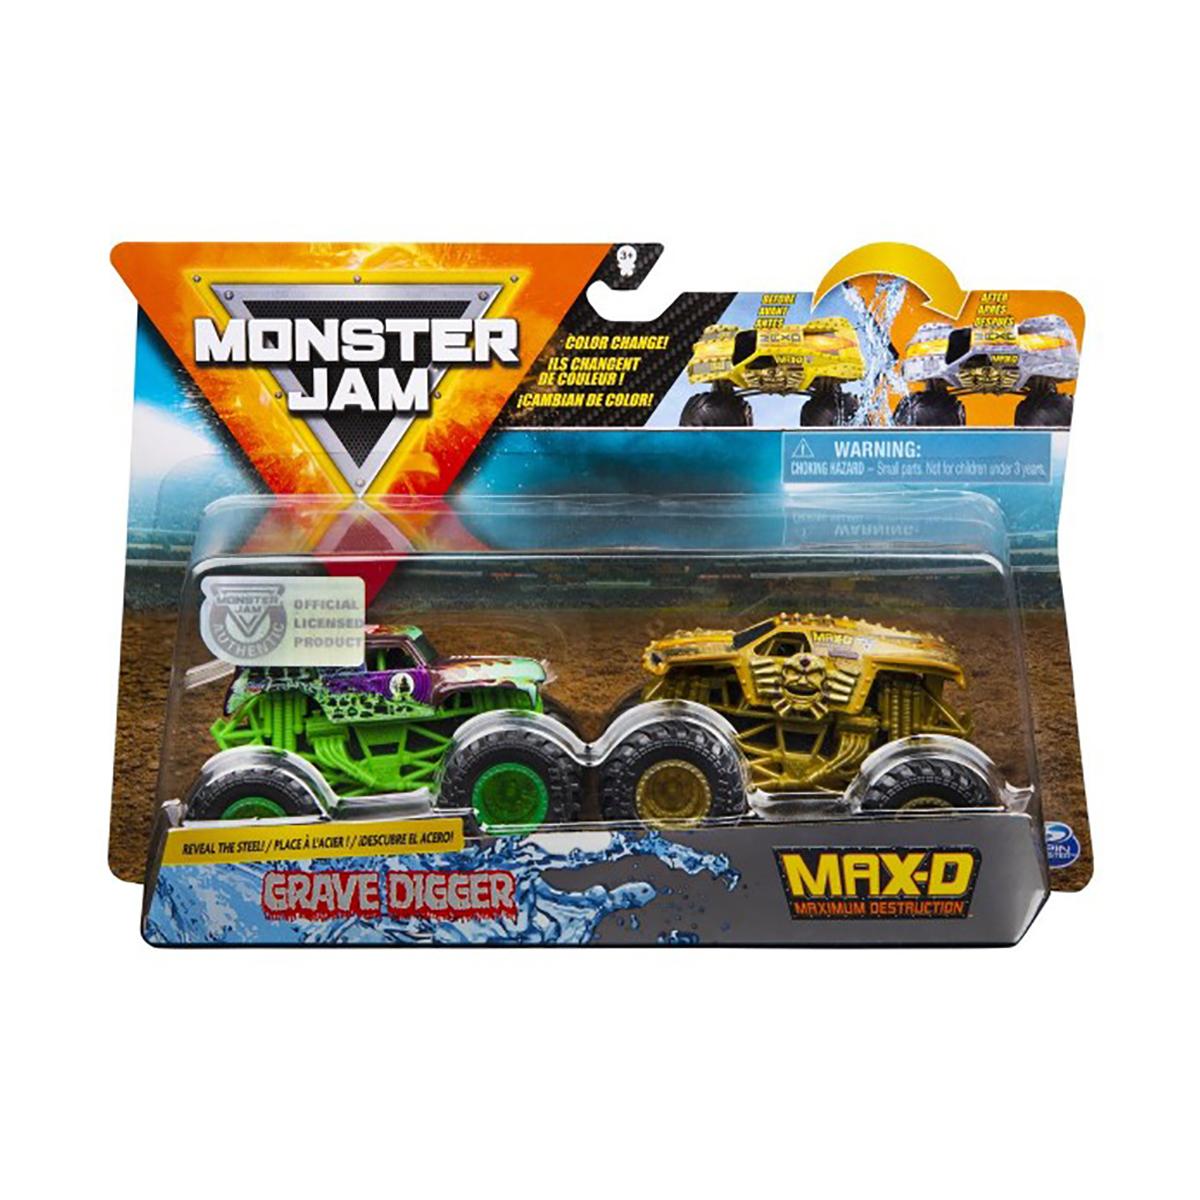 Set 2 masini Monster Jam, Scara 1:64, Grave Digger si Max-D